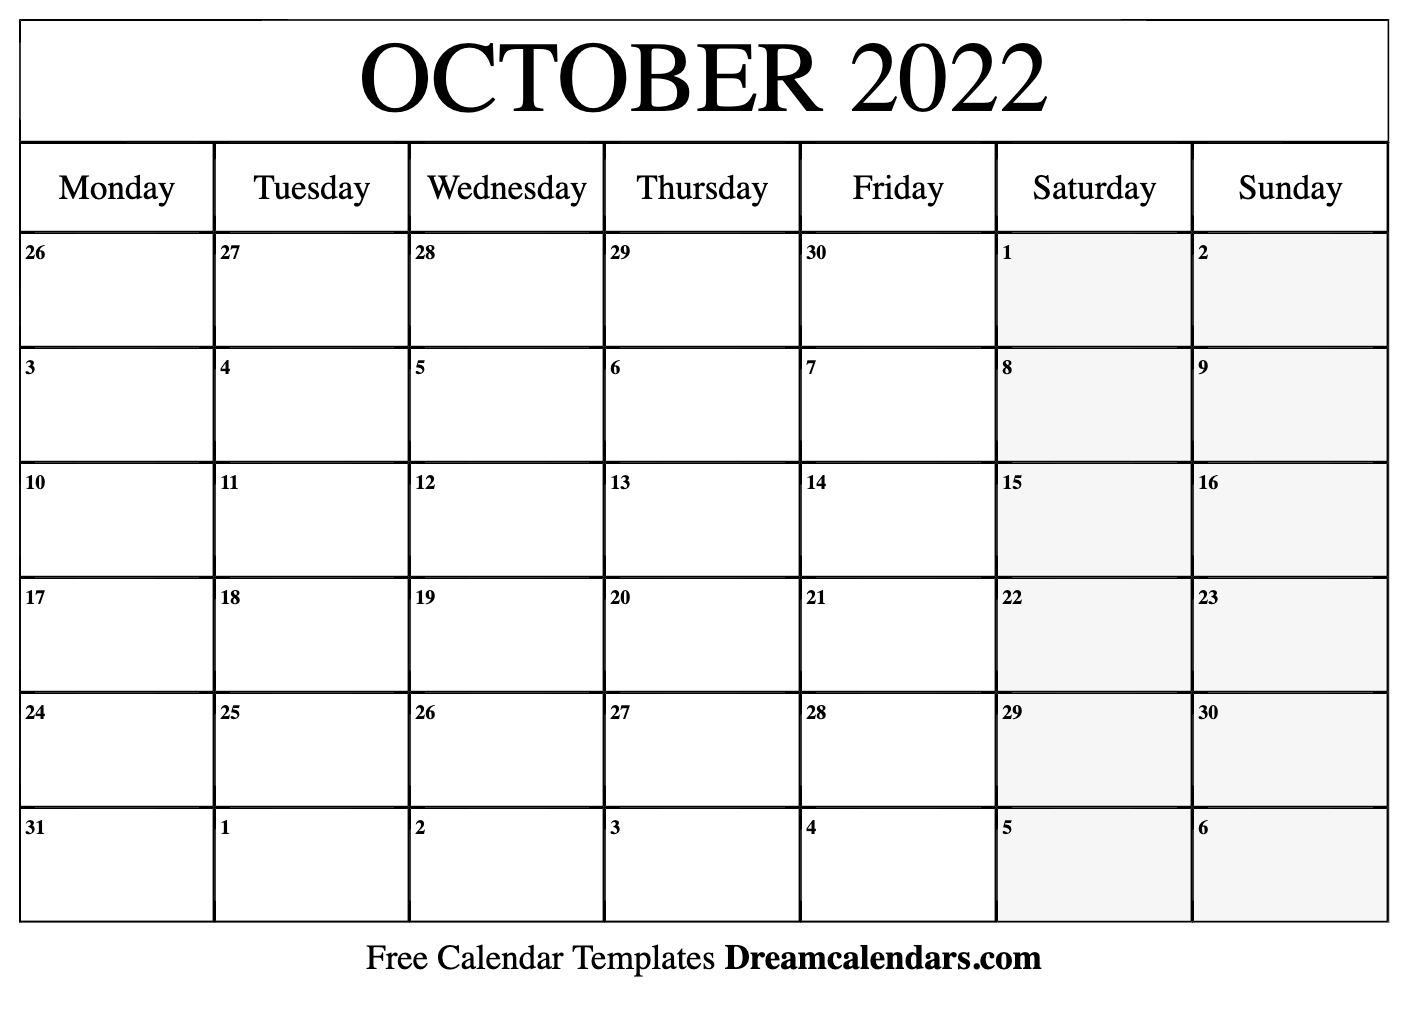 Printable October 2022 Calendar Word.October 2022 Calendar Free Blank Printable Templates